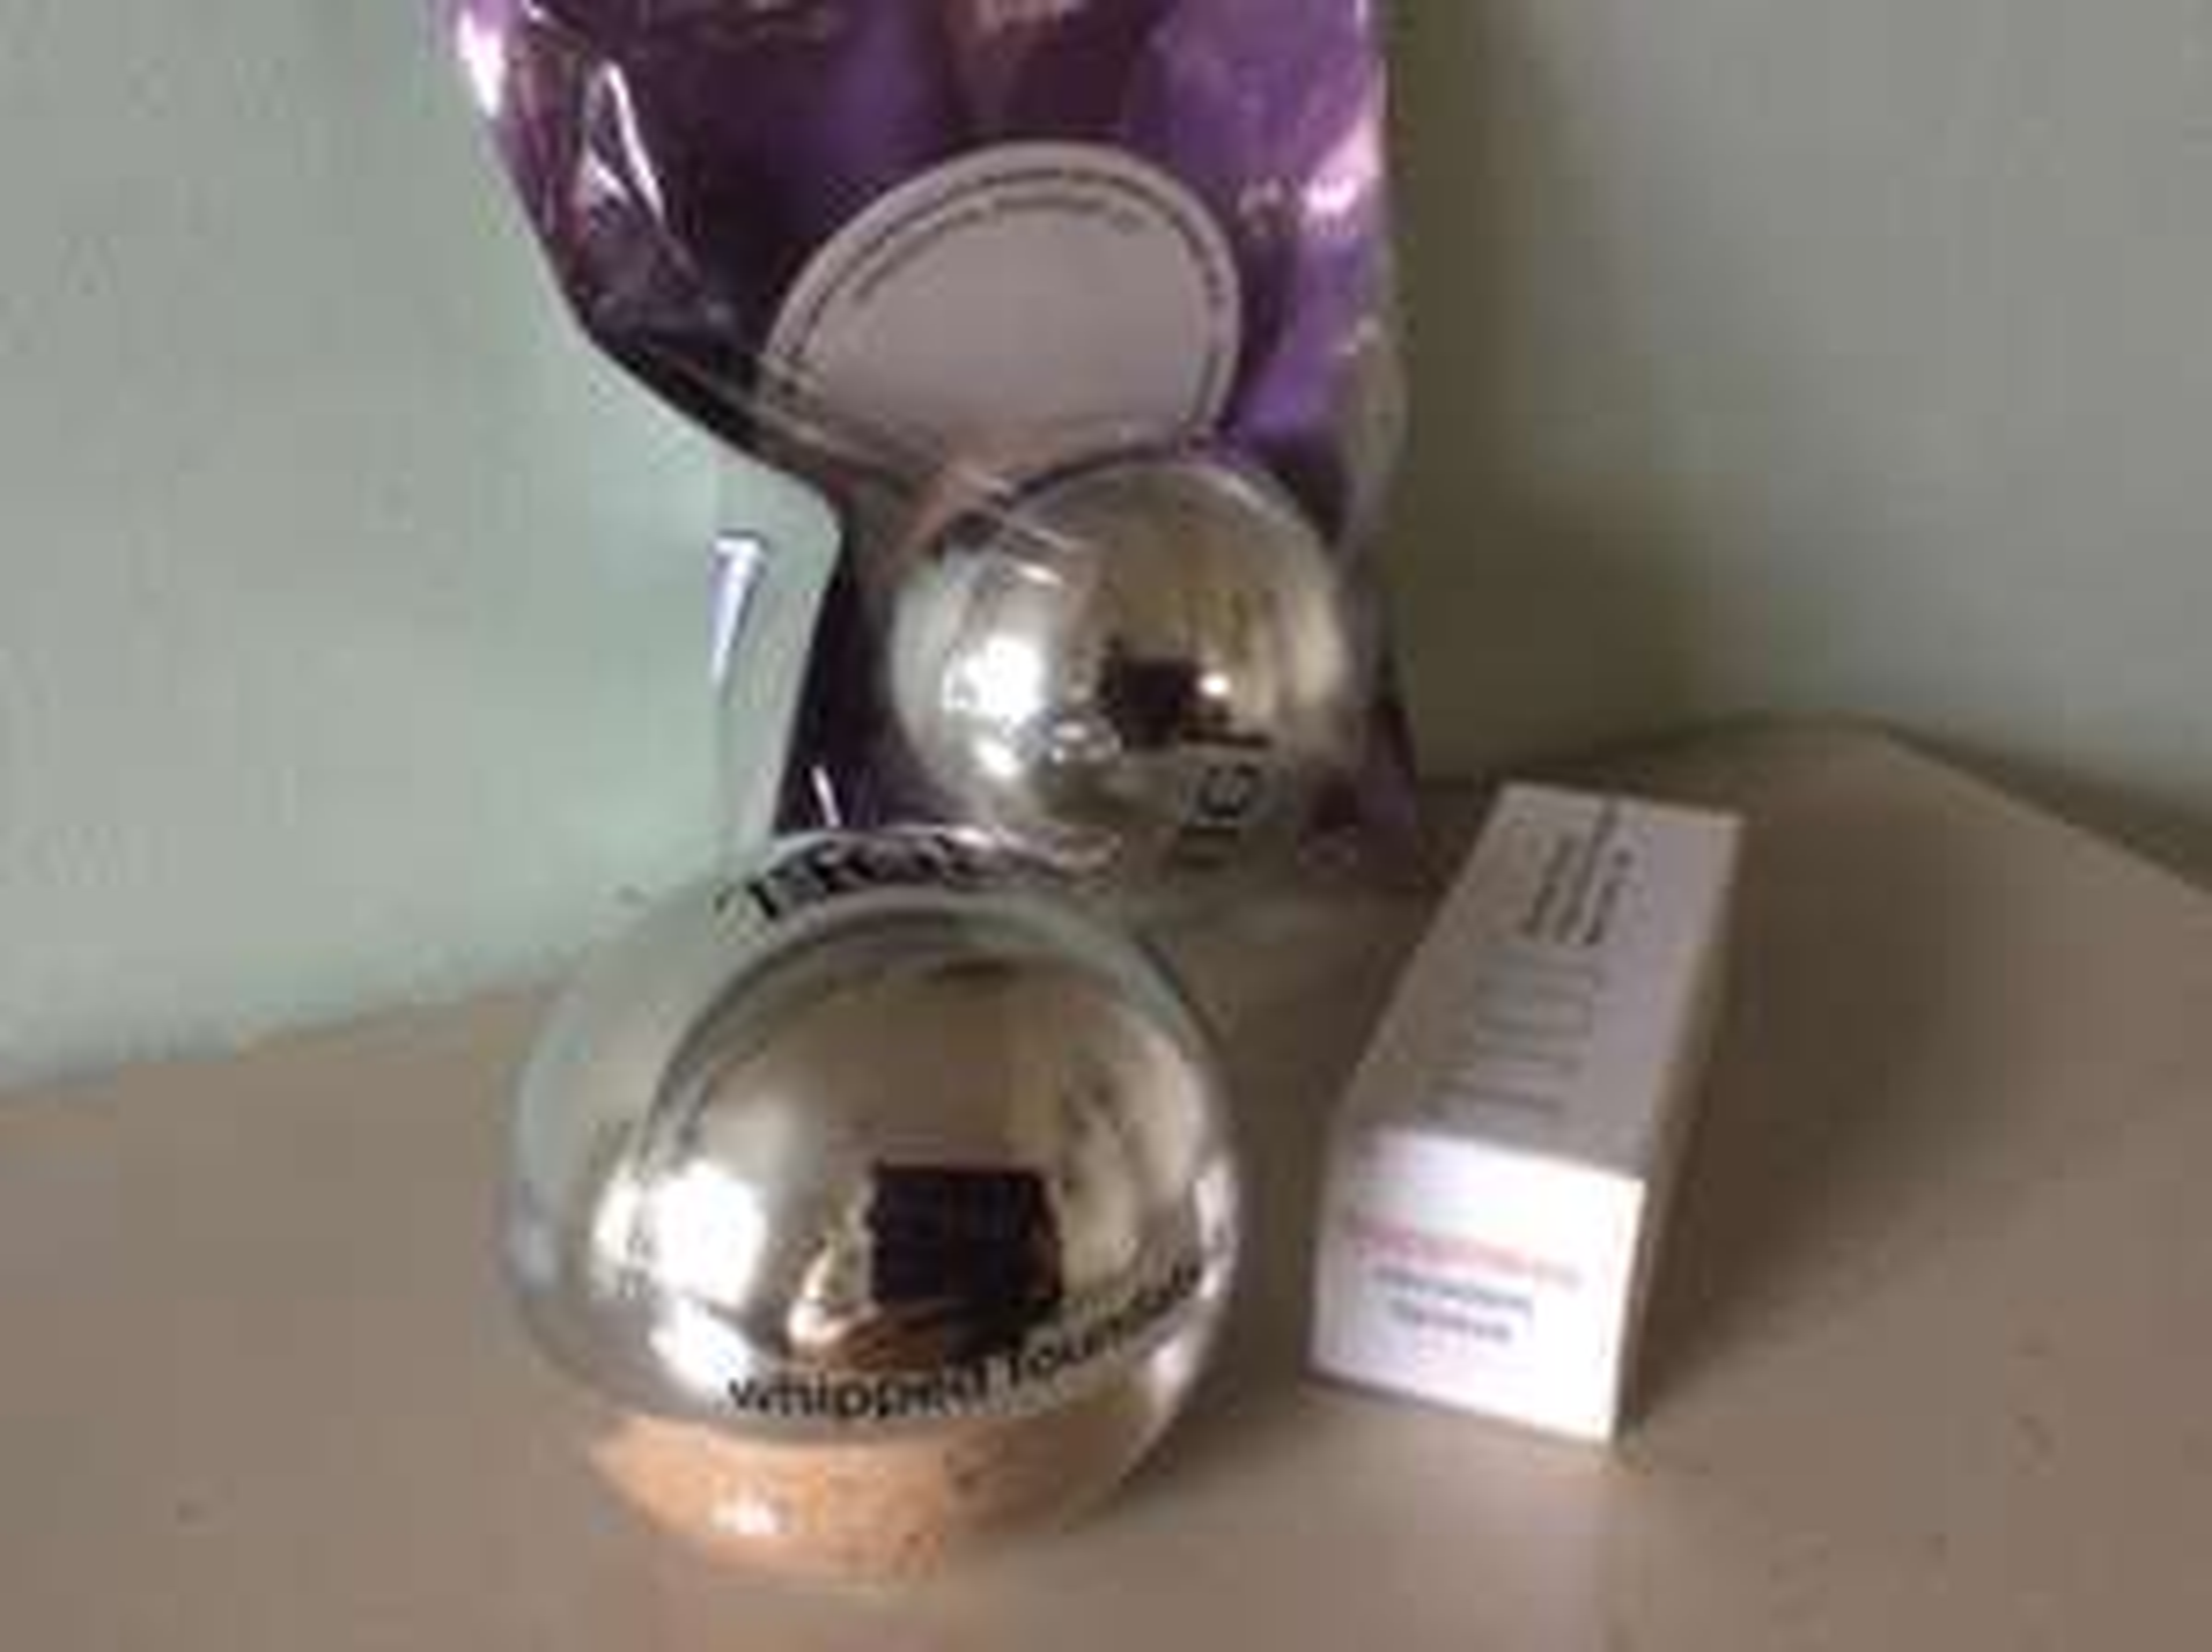 Tigi Cosmetics in Poundland £1